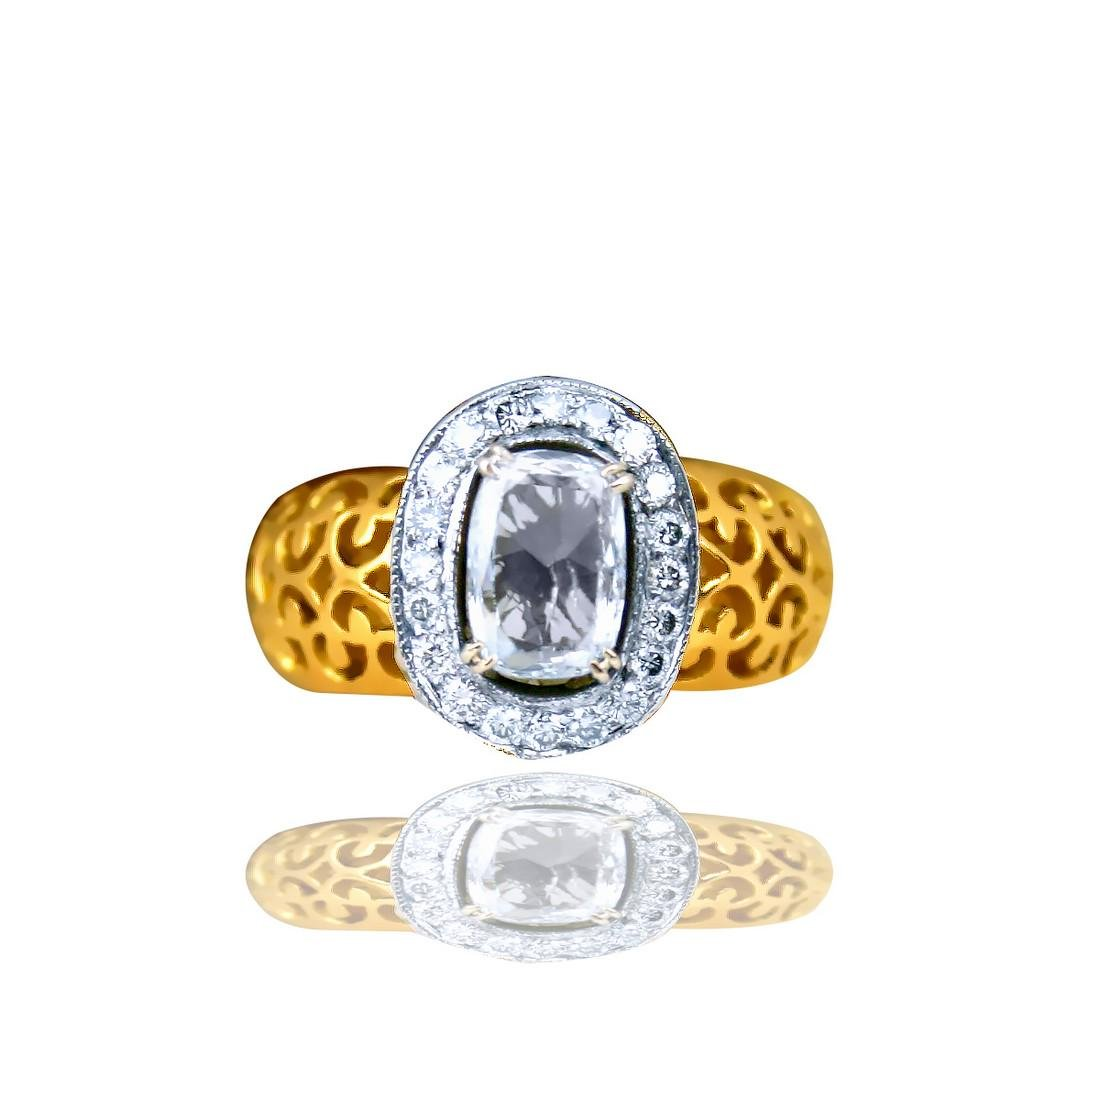 Edwardian, Filigree 1.25 Carat Cushion Cut Diamond Ring